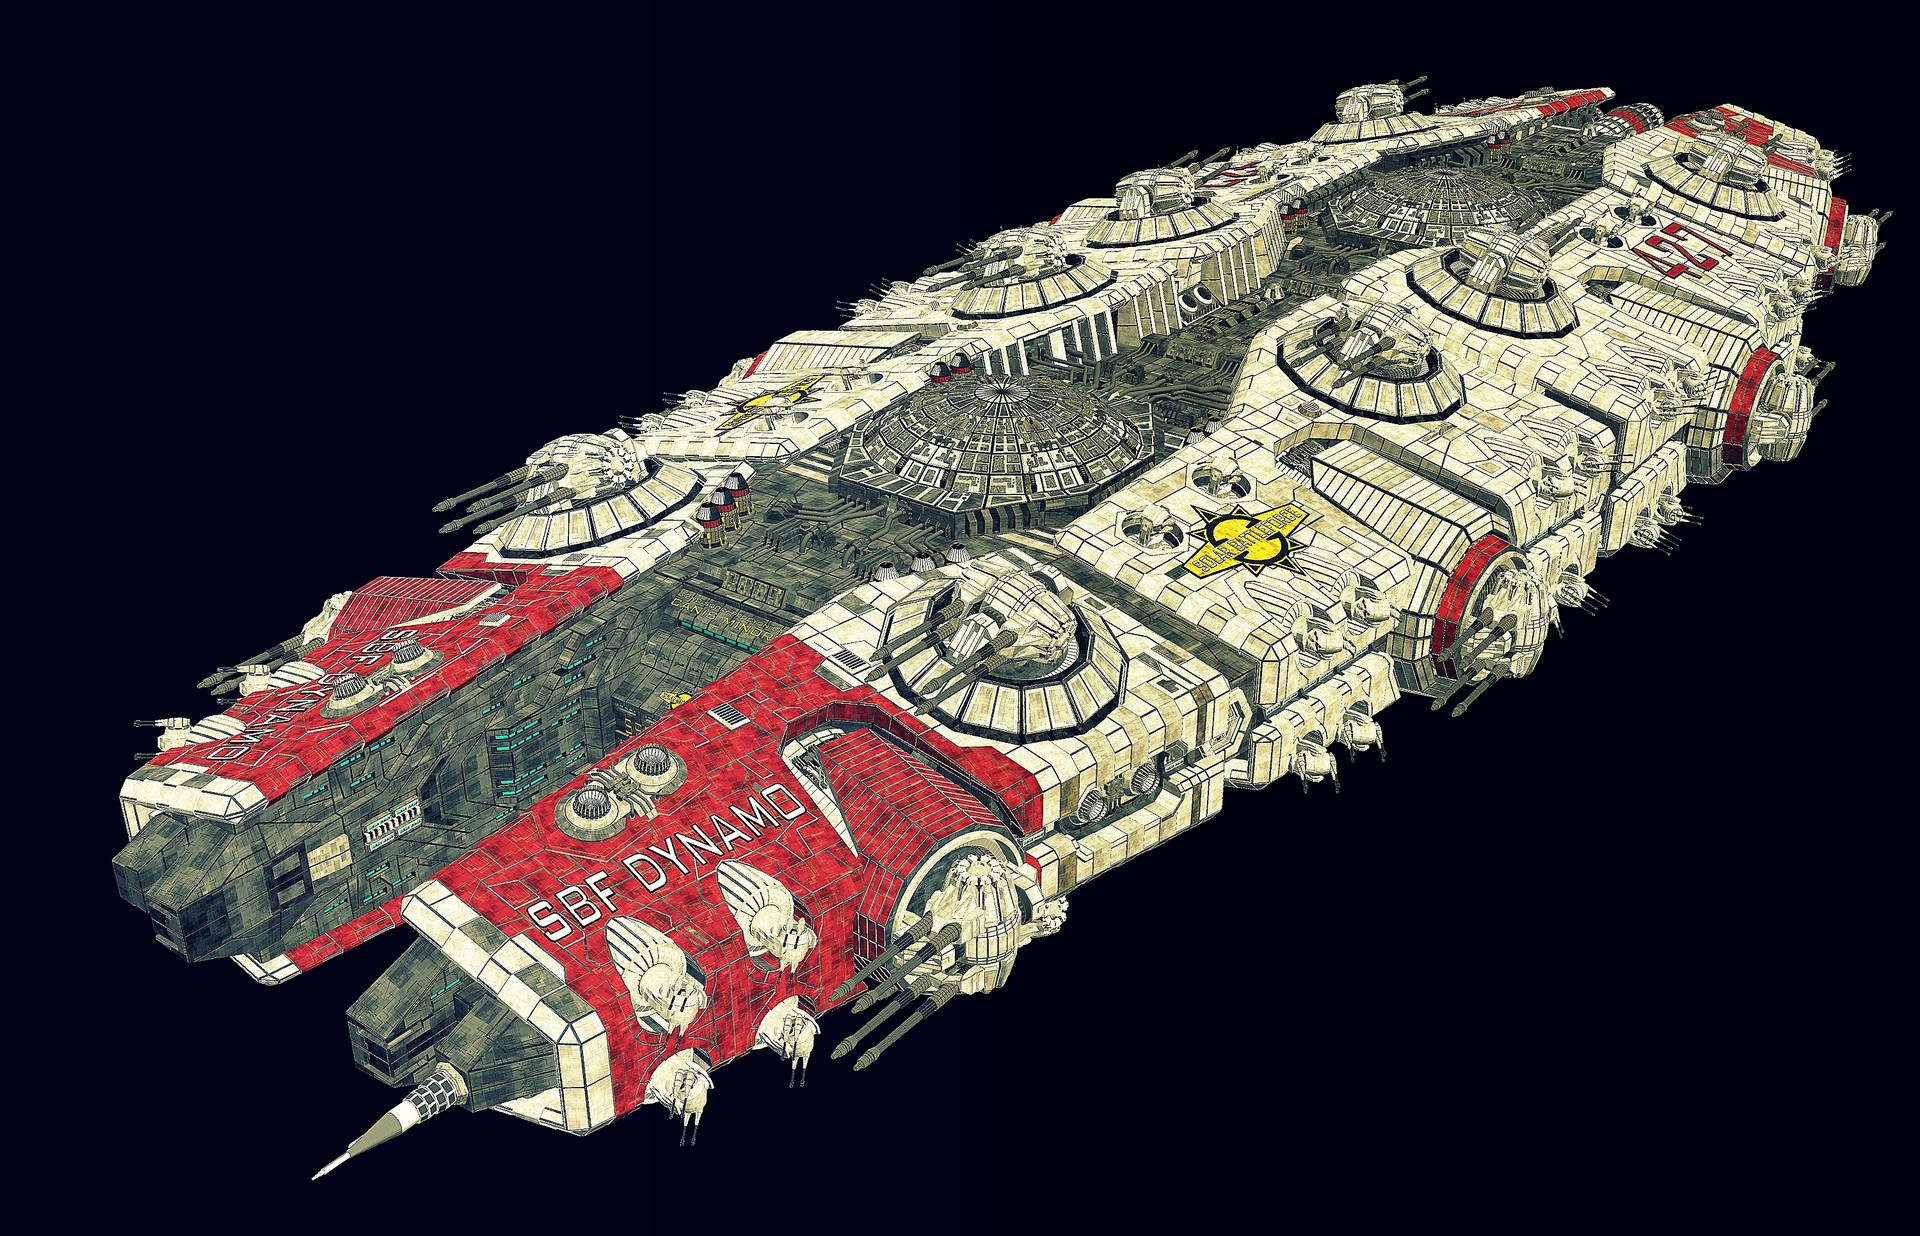 Joachim sverd prototype frigate23